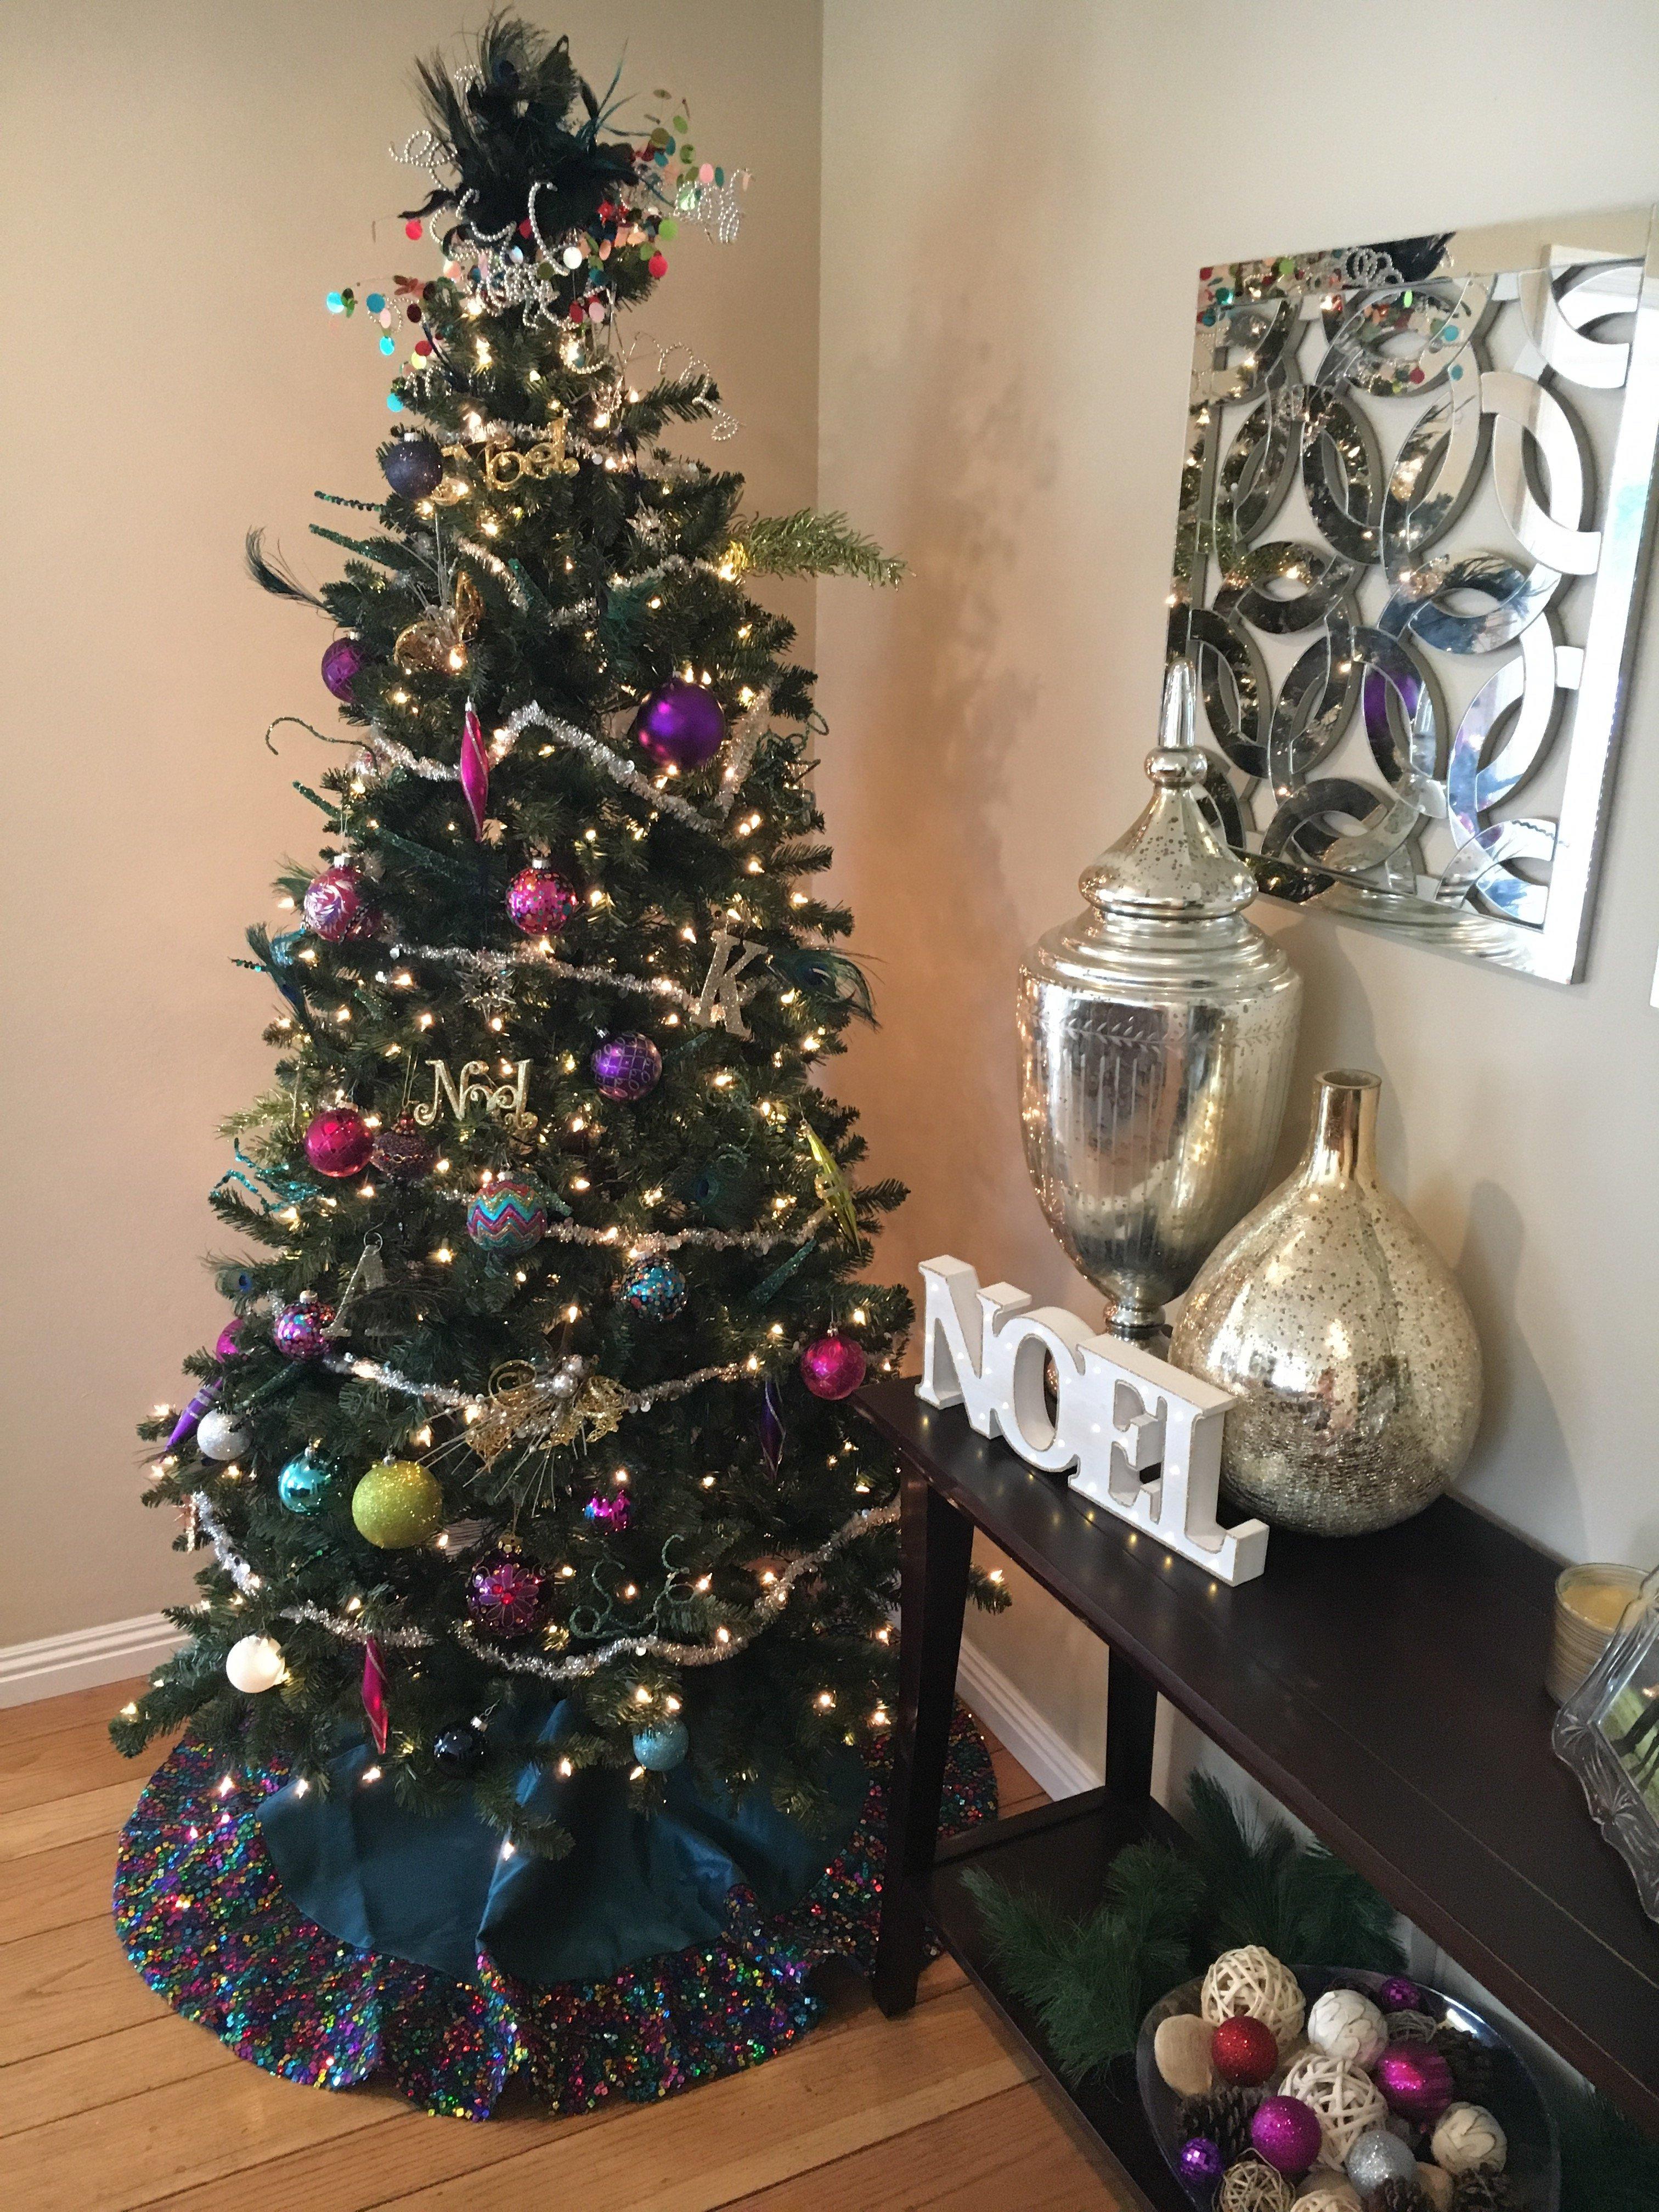 Christmas decor ideas | tips for decorating Christmas tree | how to decorate Christmas tree